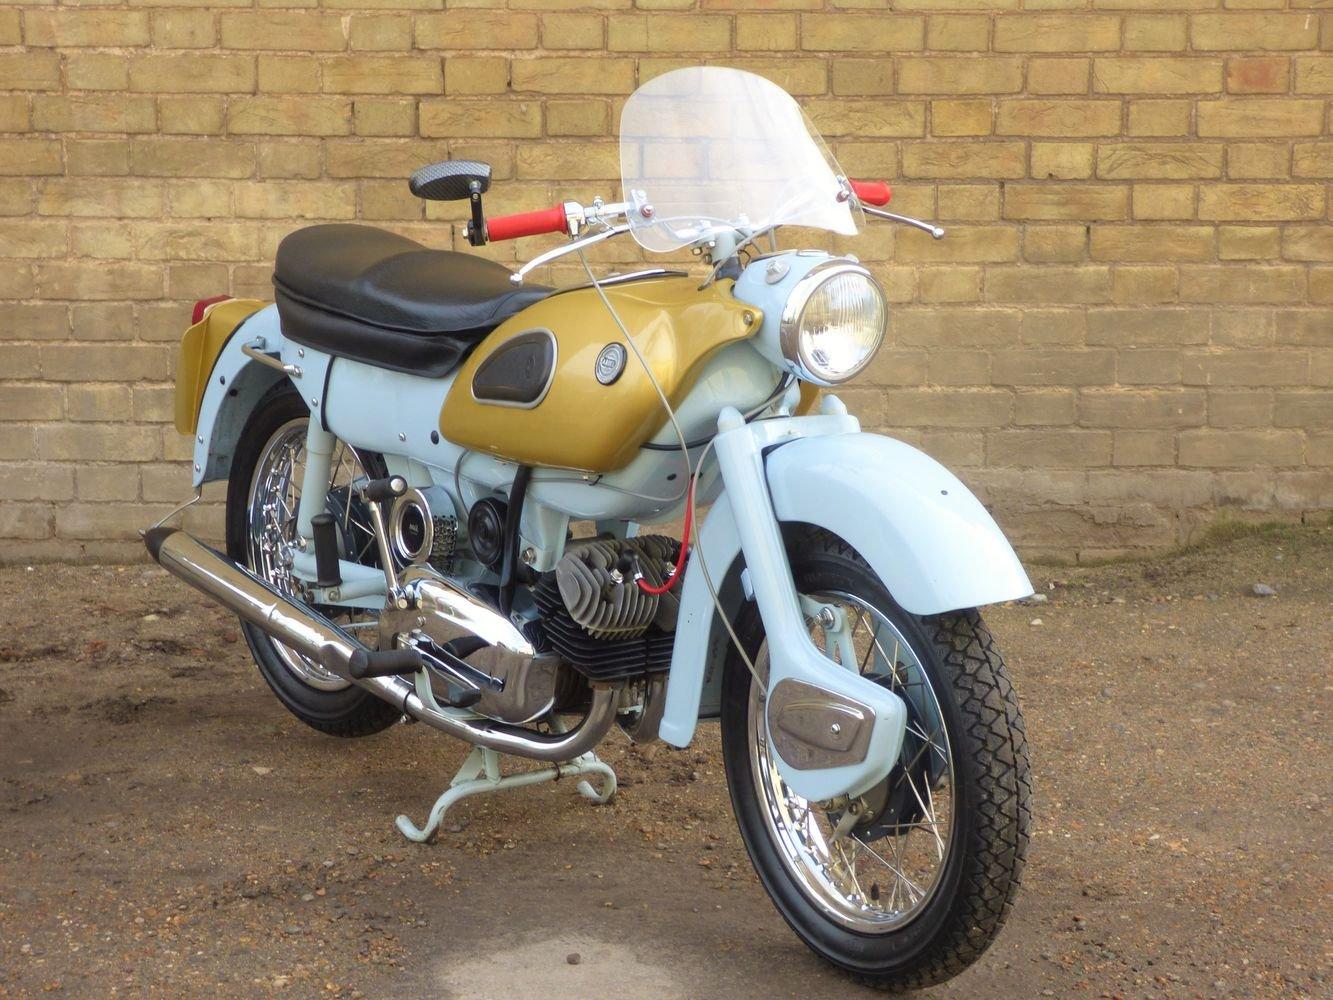 1961 Ariel 'Golden' Arrow Super Sports 250cc SOLD (picture 6 of 6)